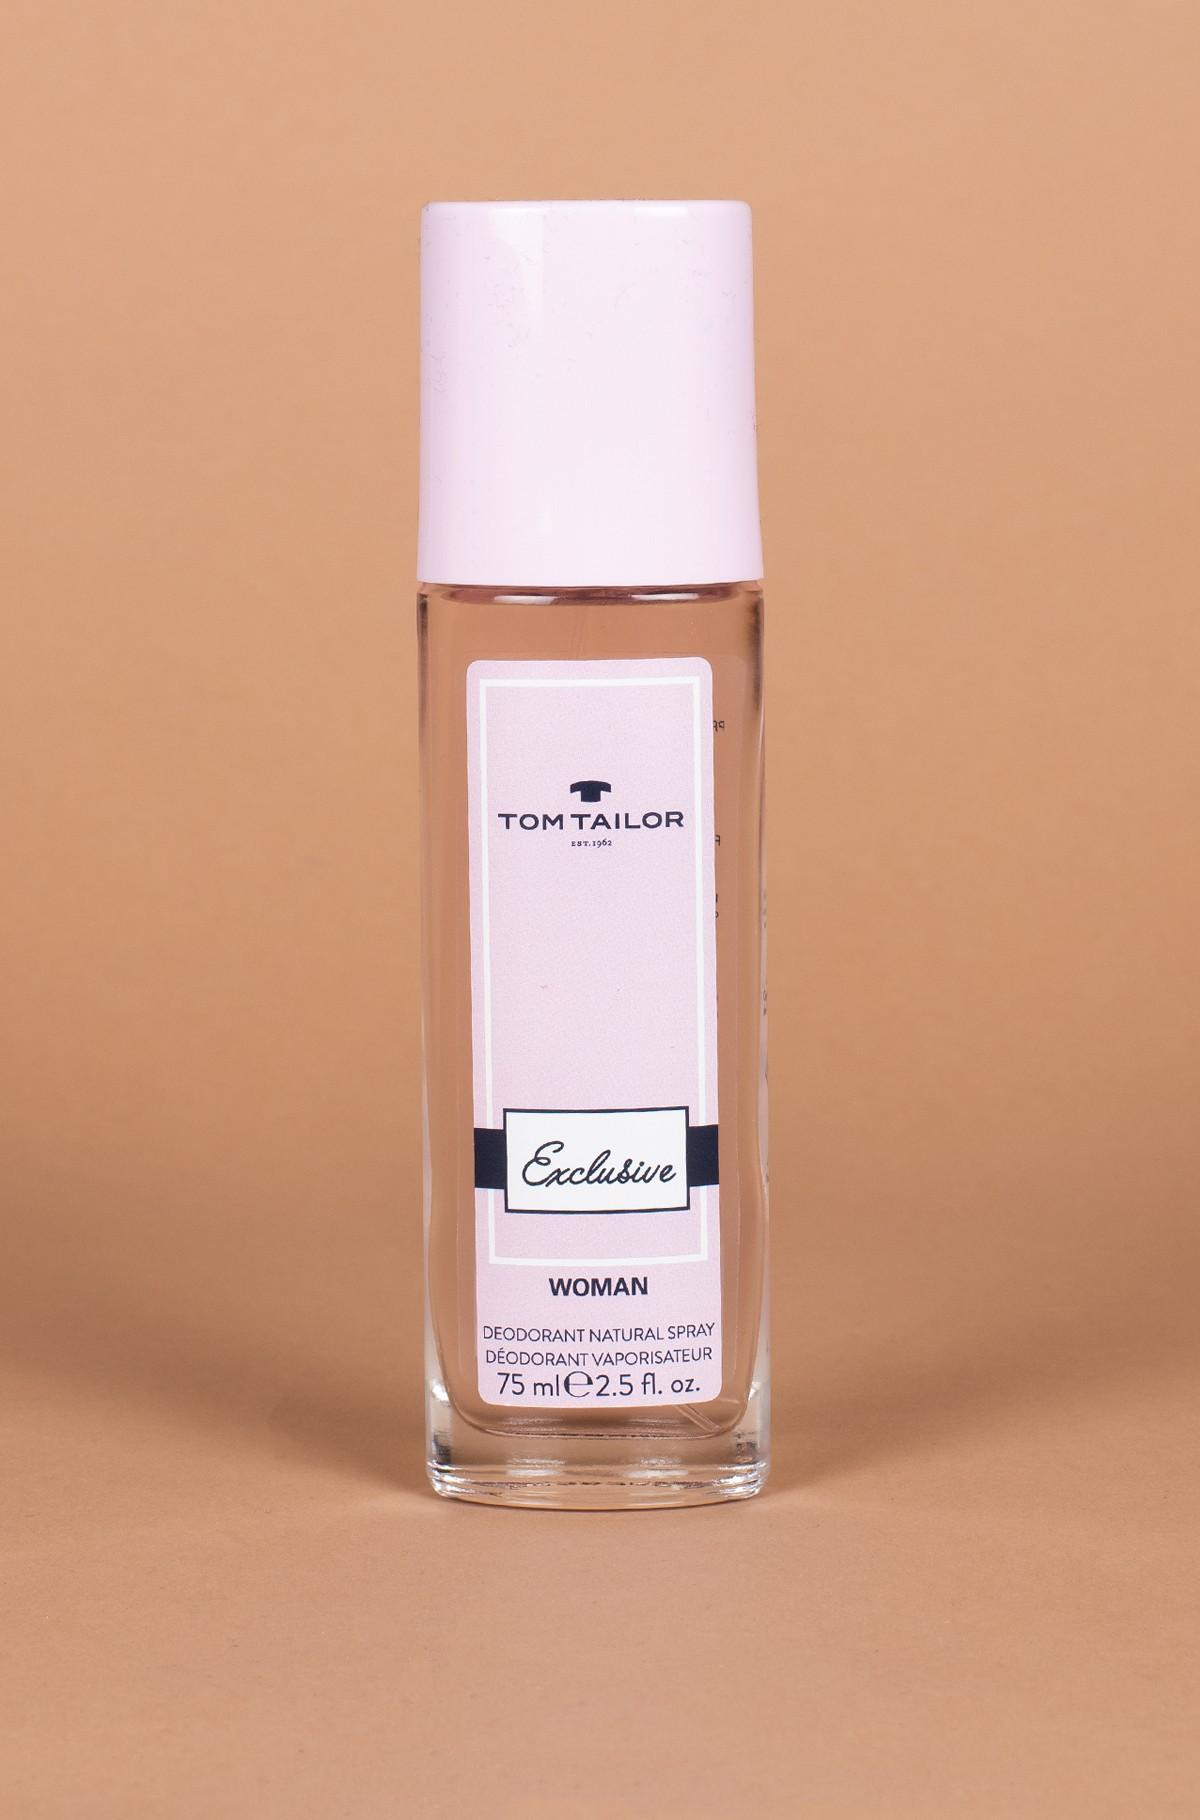 Lõhnavesi Exclusive Woman deodorant 75ml-full-1